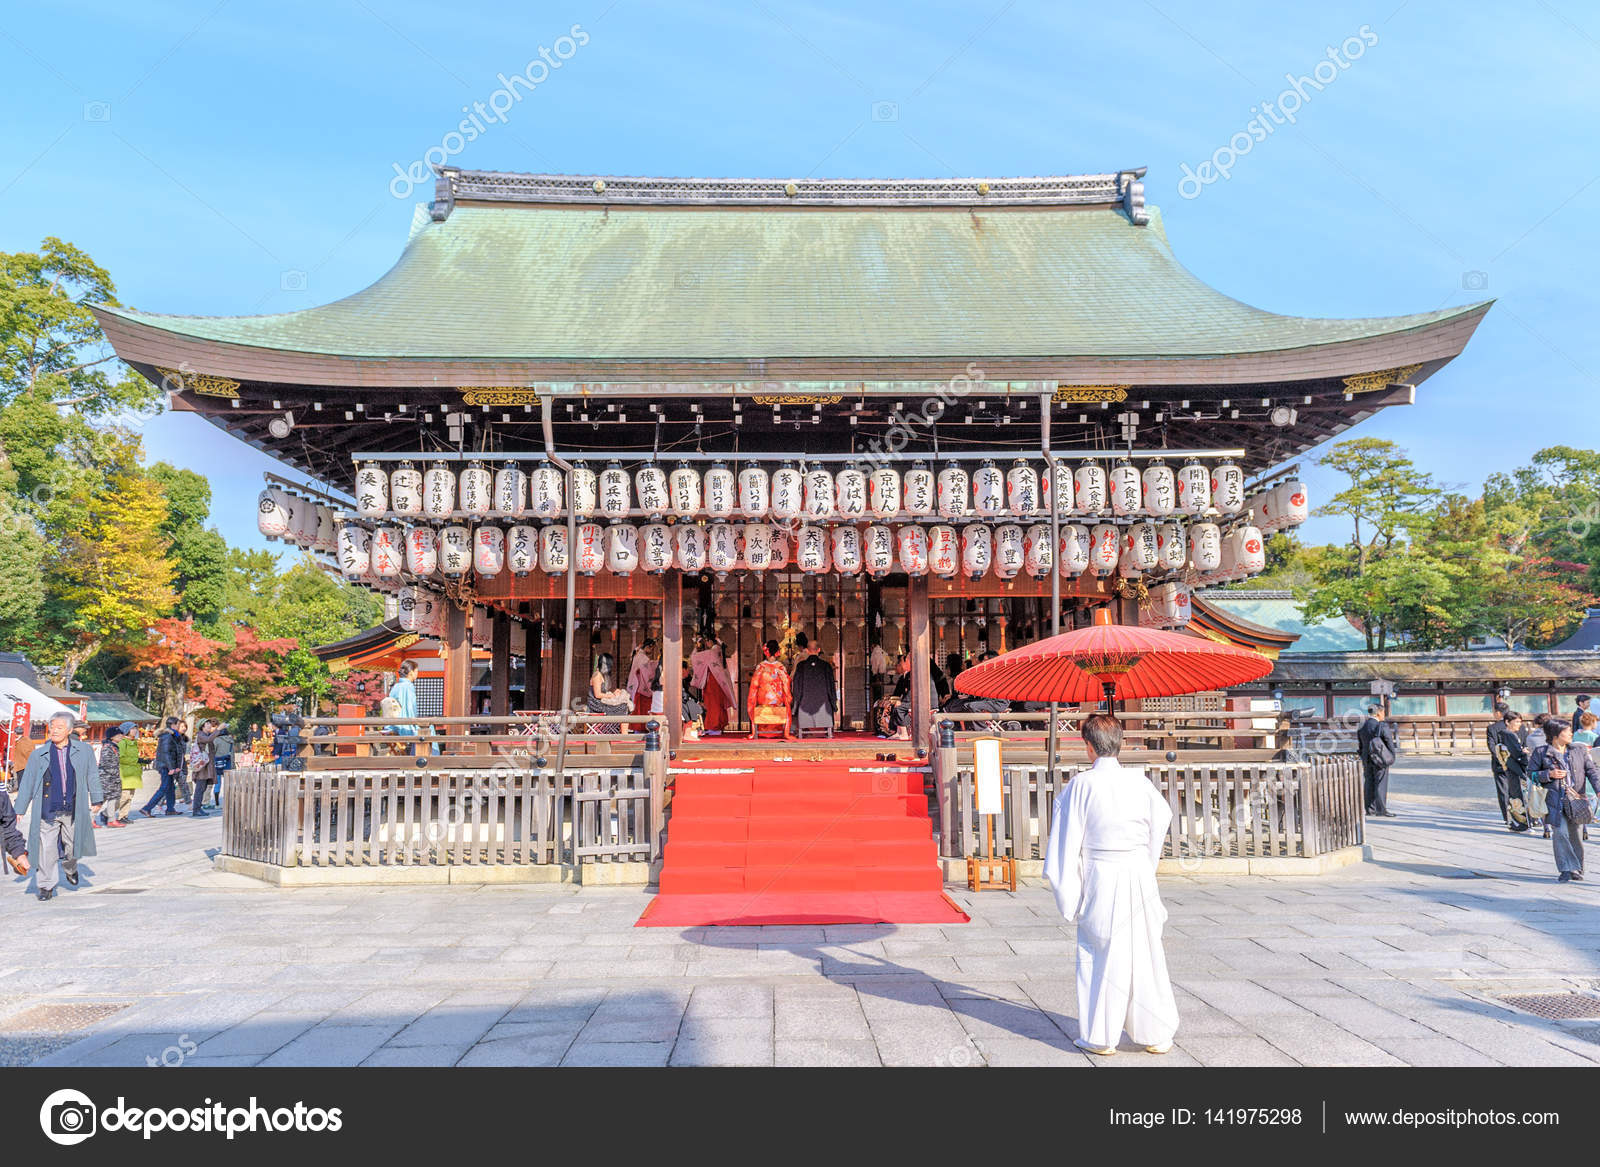 The Shinto Religion Is Native To Japan Stock Photo Richie - Shinto religion